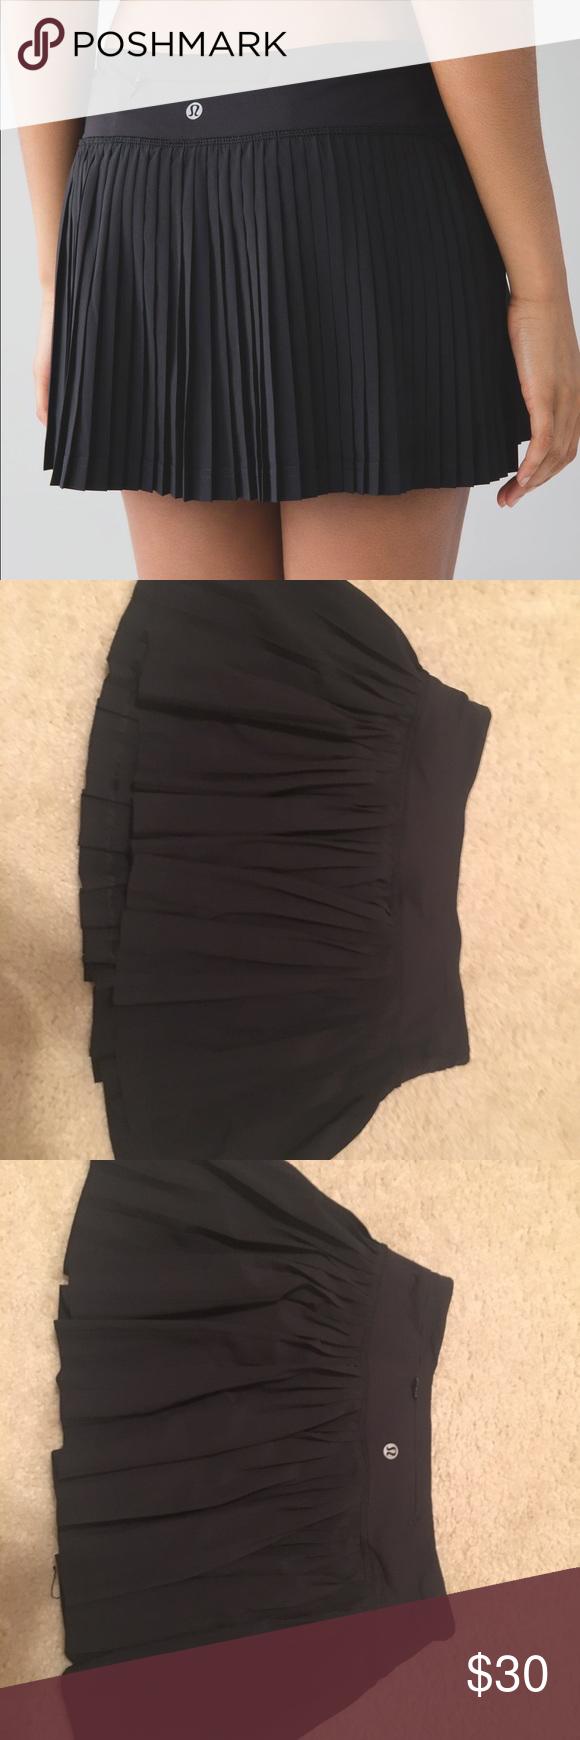 Lululemon skirt black pleated skirt lululemon and shorts